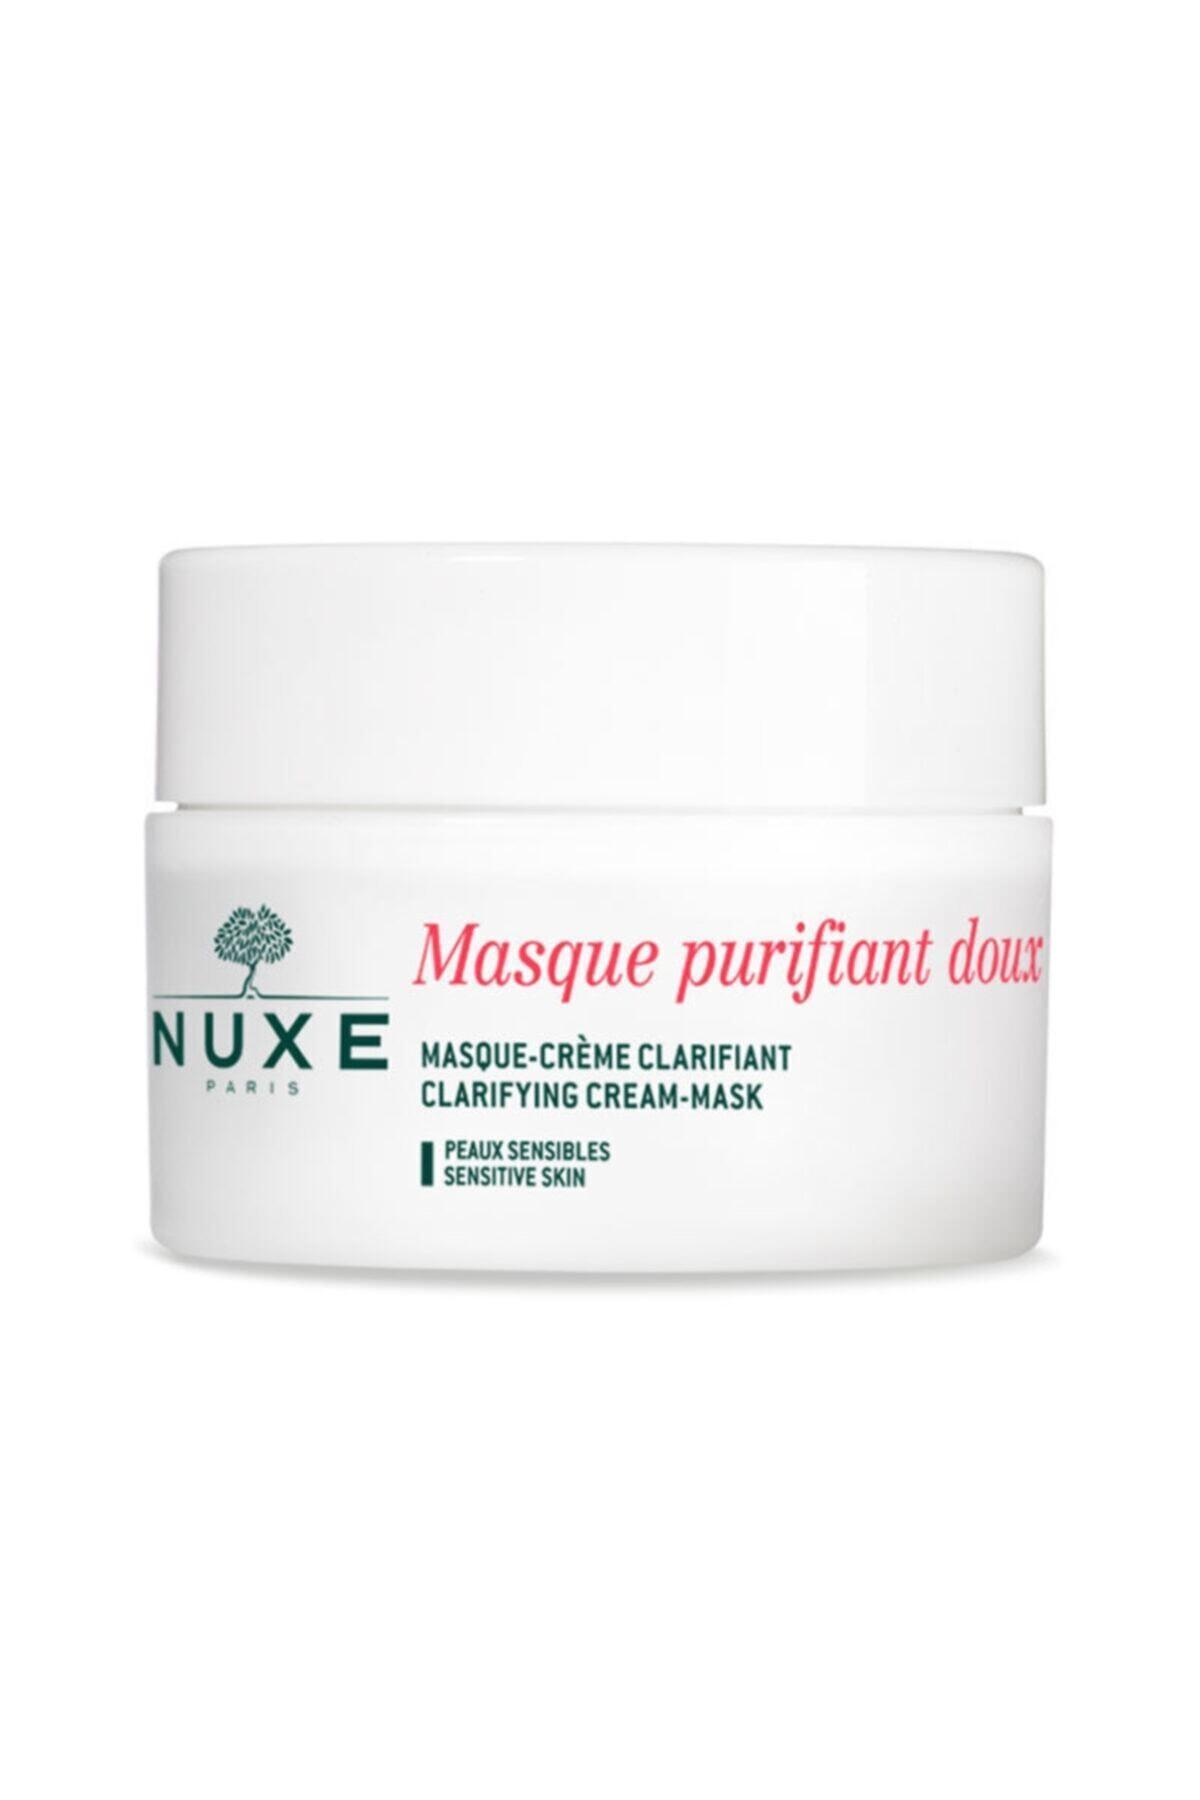 Nuxe Masque Purifiant Doux 50ml 1